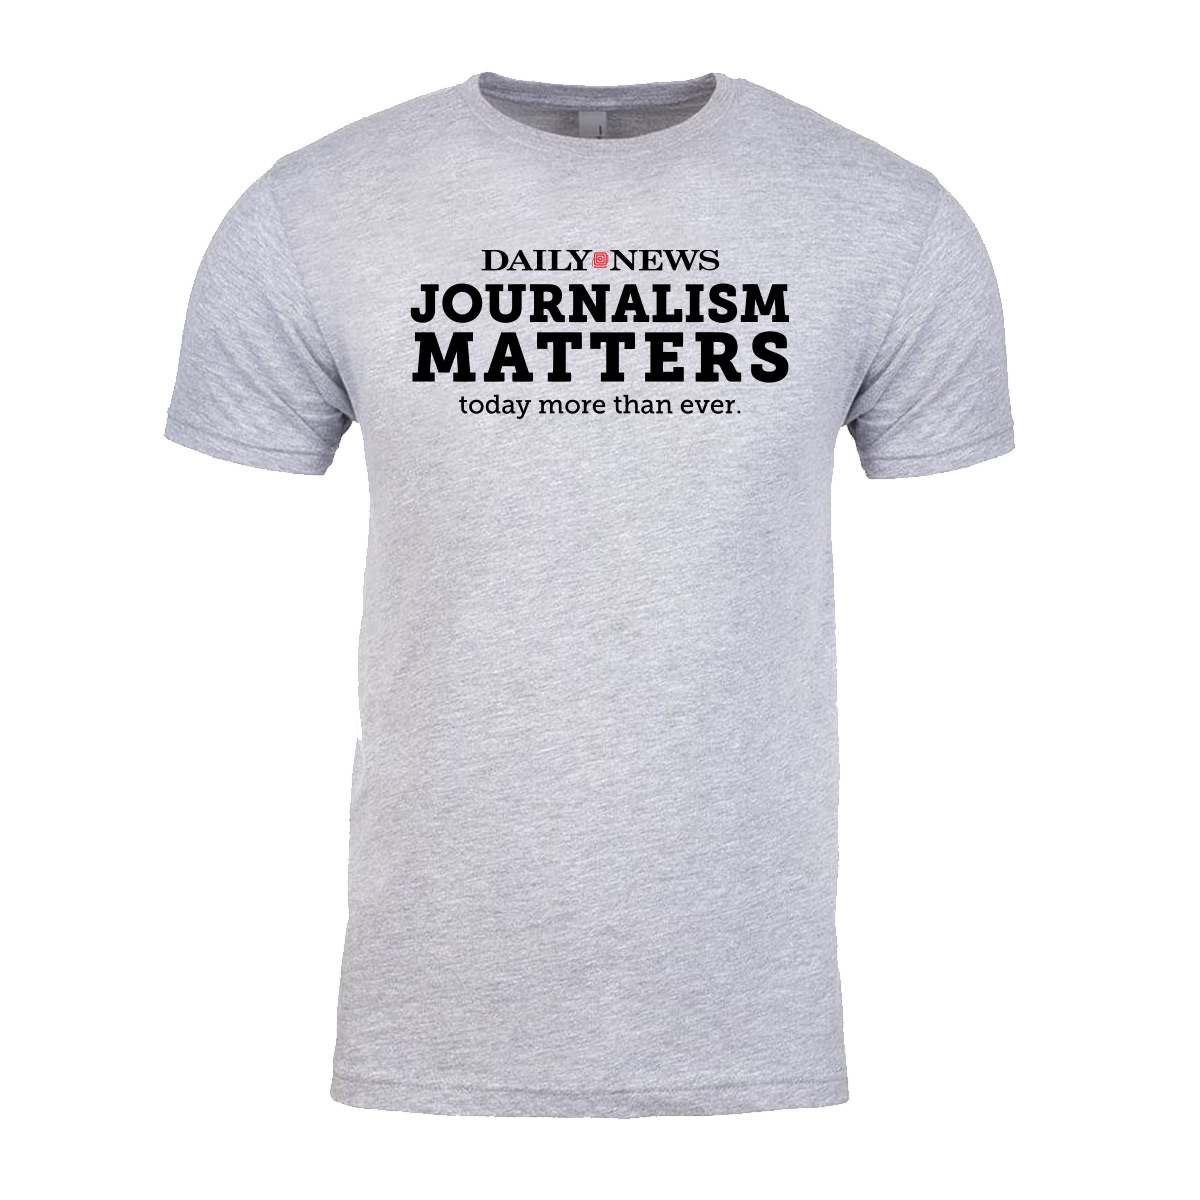 Daily News Journalism Matters Shirt